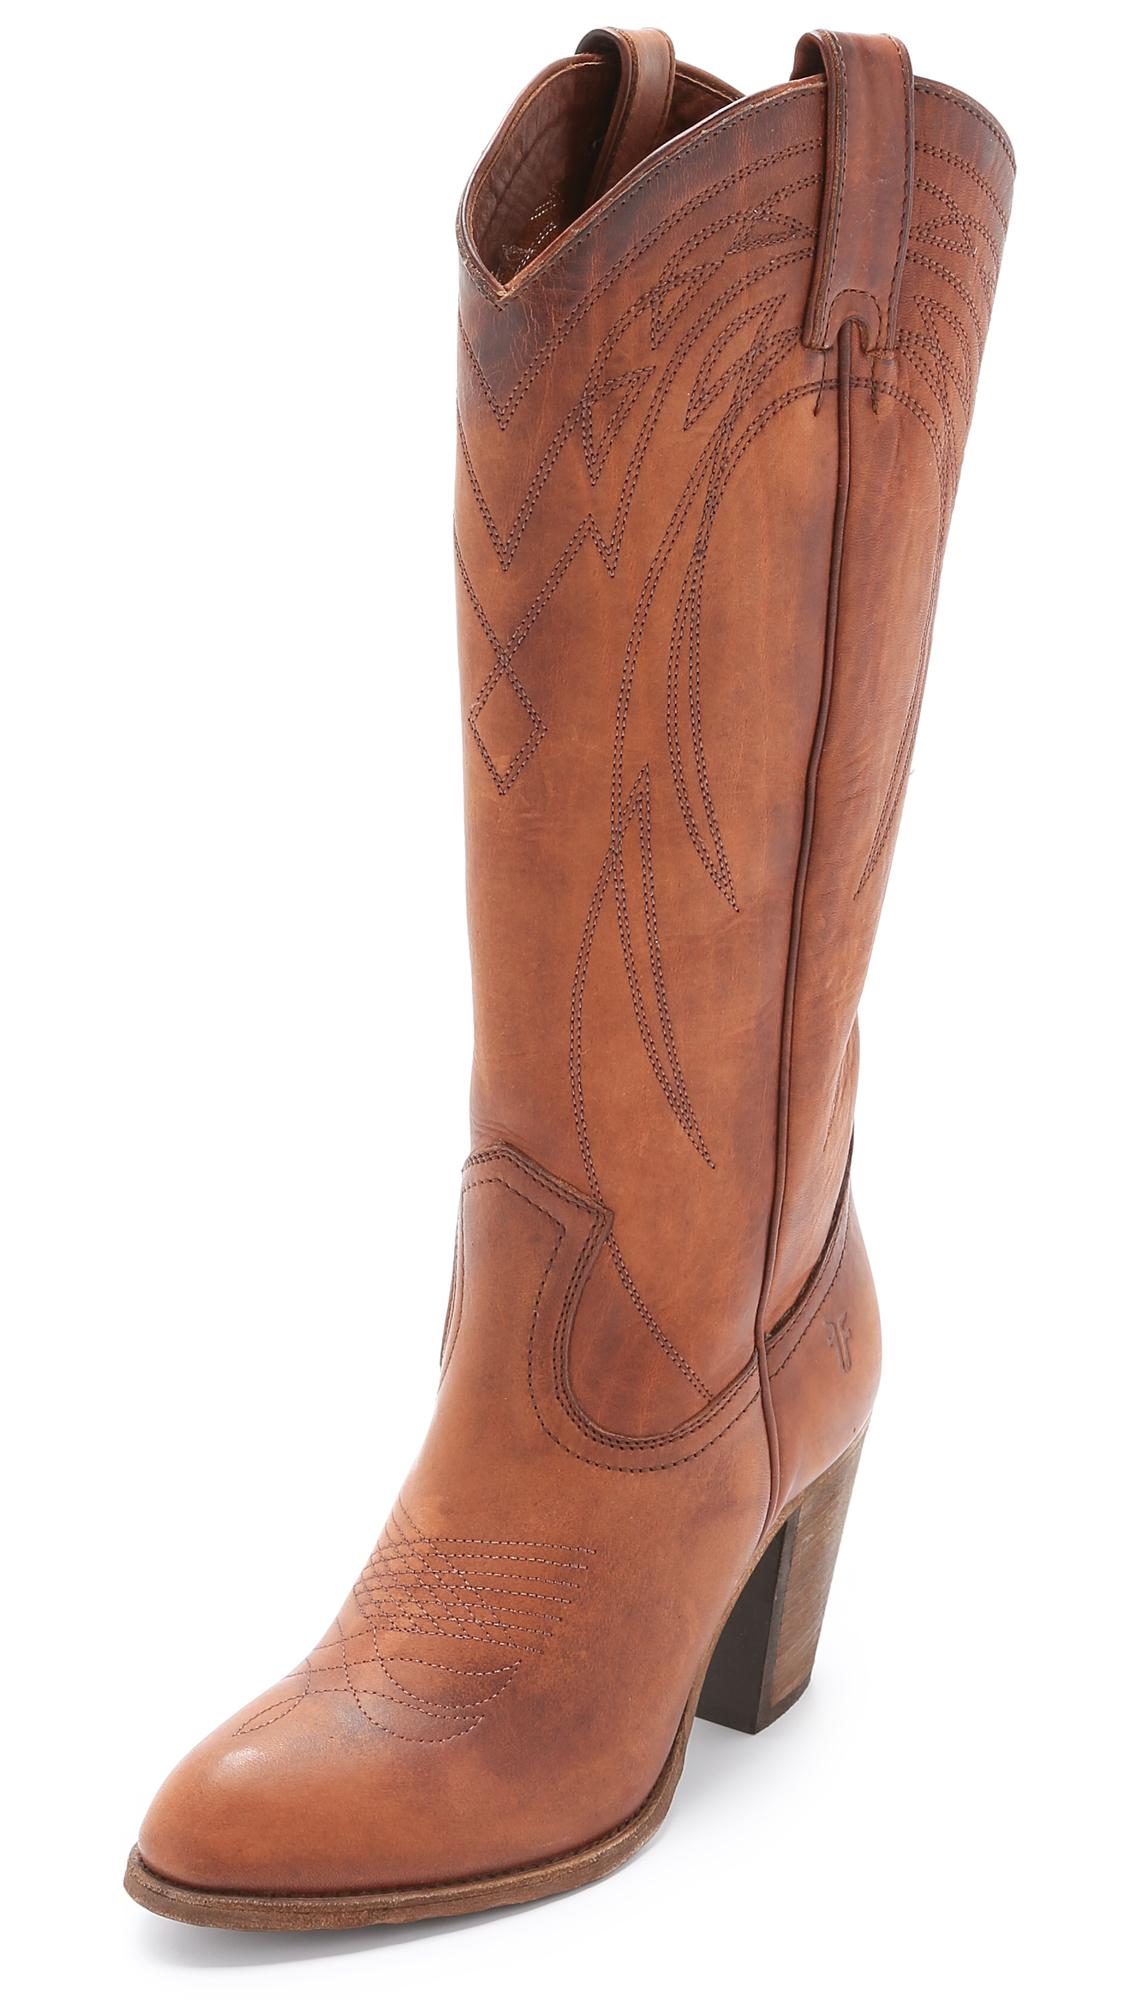 Frye Ilana Pull On Boots - Cognac